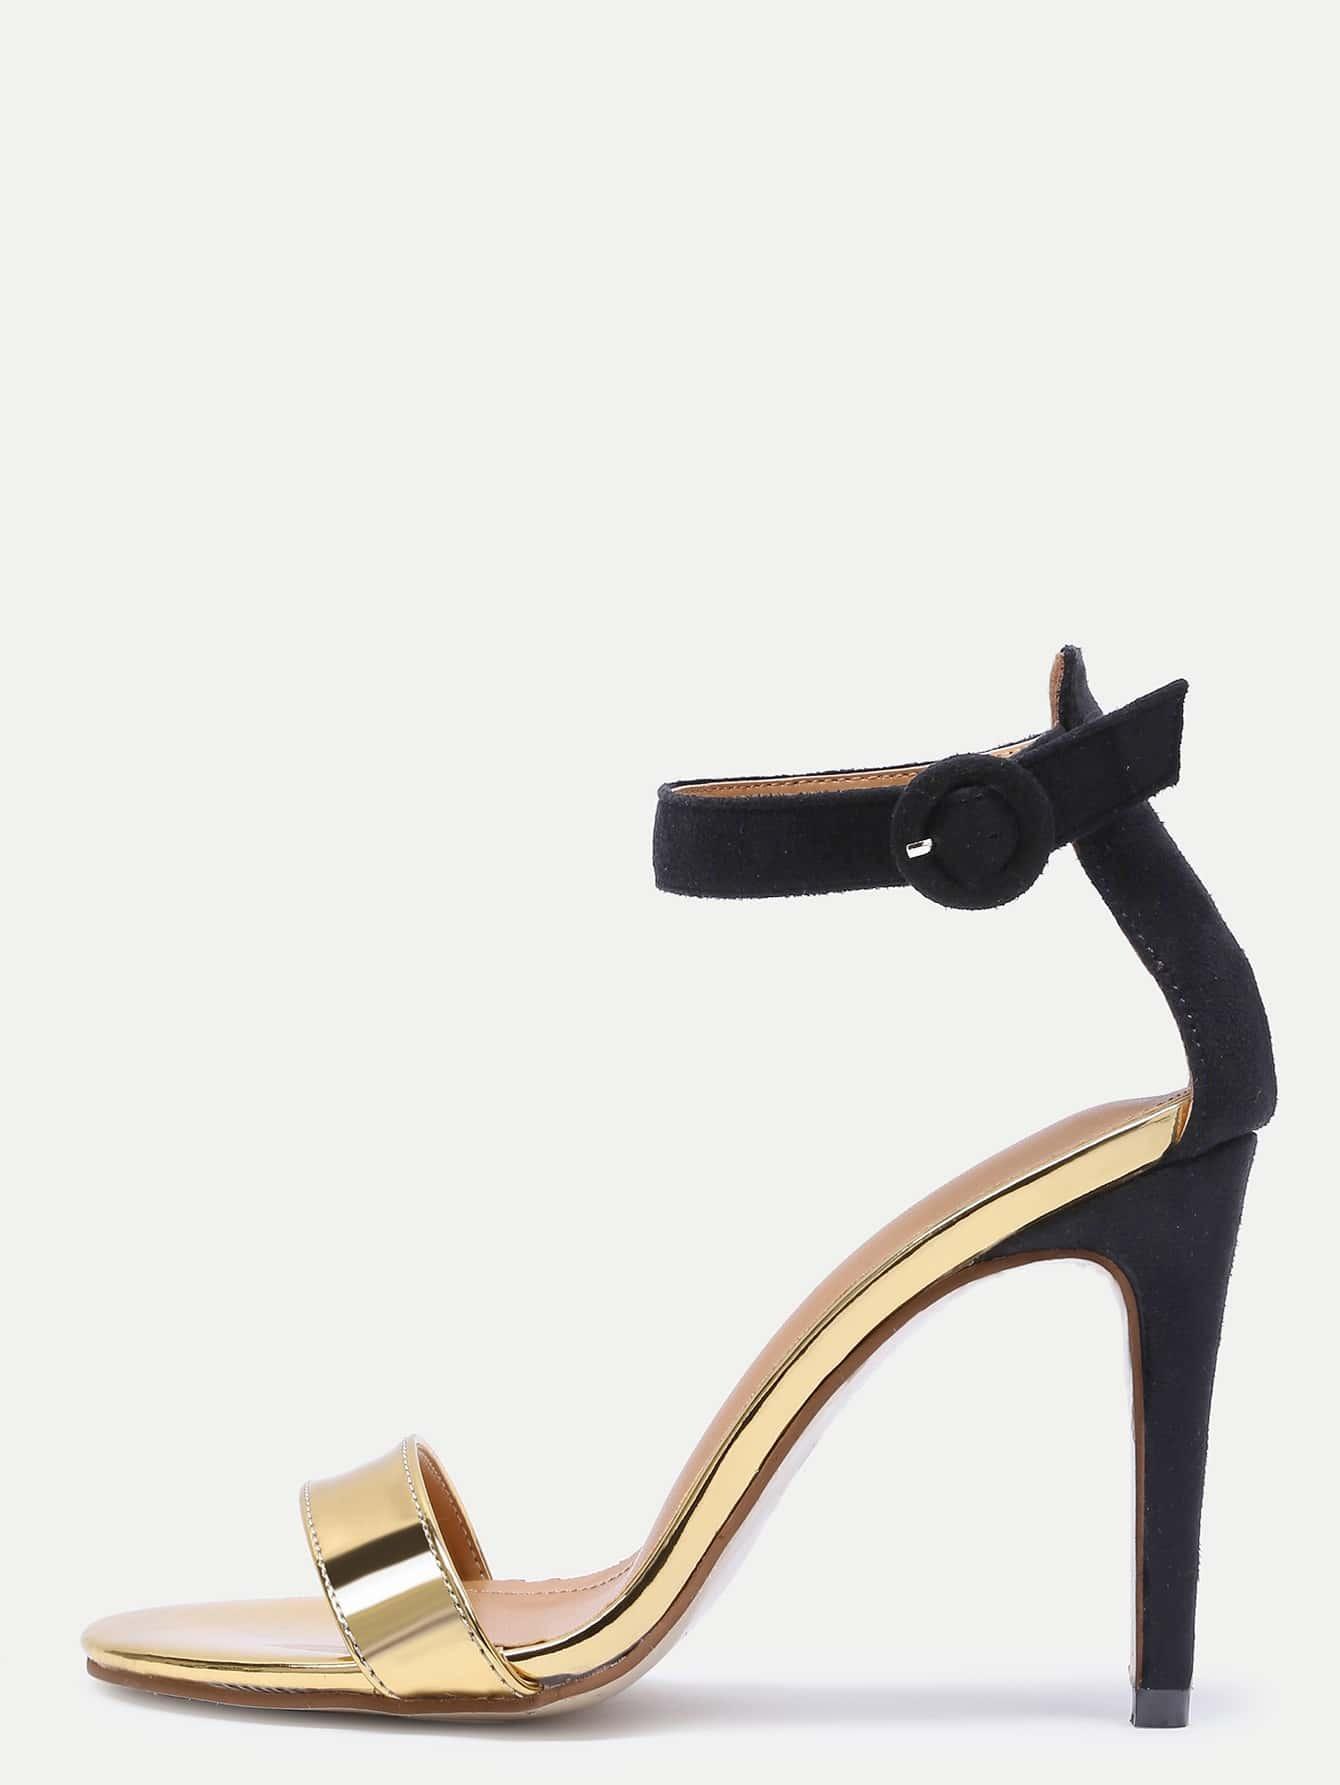 PU and Suede Open Toe Ankle Strap Stiletto SandalsPU and Suede Open Toe Ankle Strap Stiletto Sandals<br><br>color: Golden<br>size: EUR35,EUR36,EUR37,EUR38,EUR39,EUR40